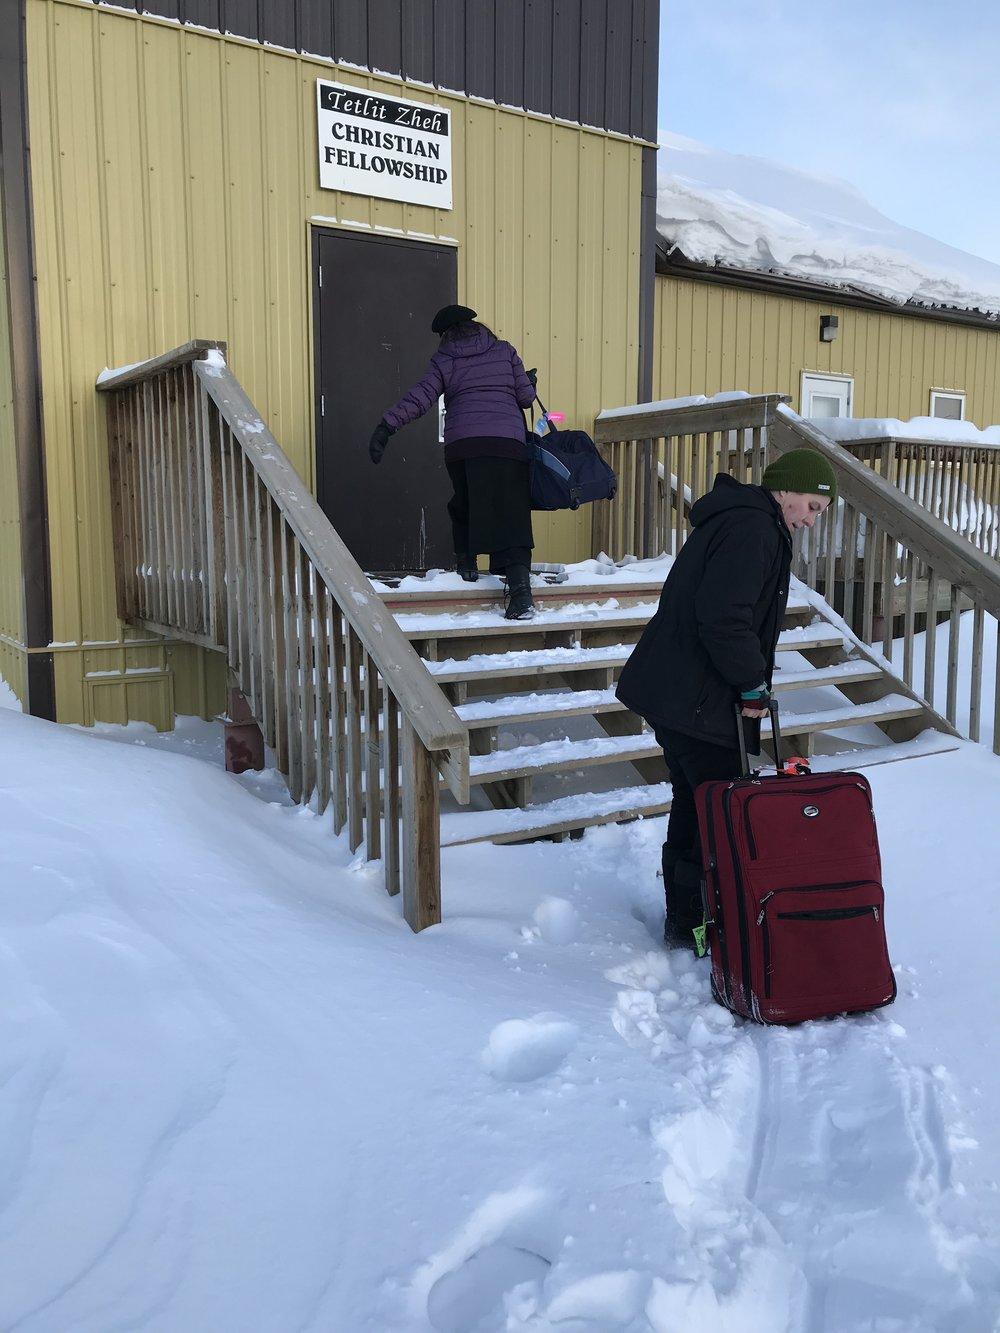 Moving gear into the Christian Fellowship Church